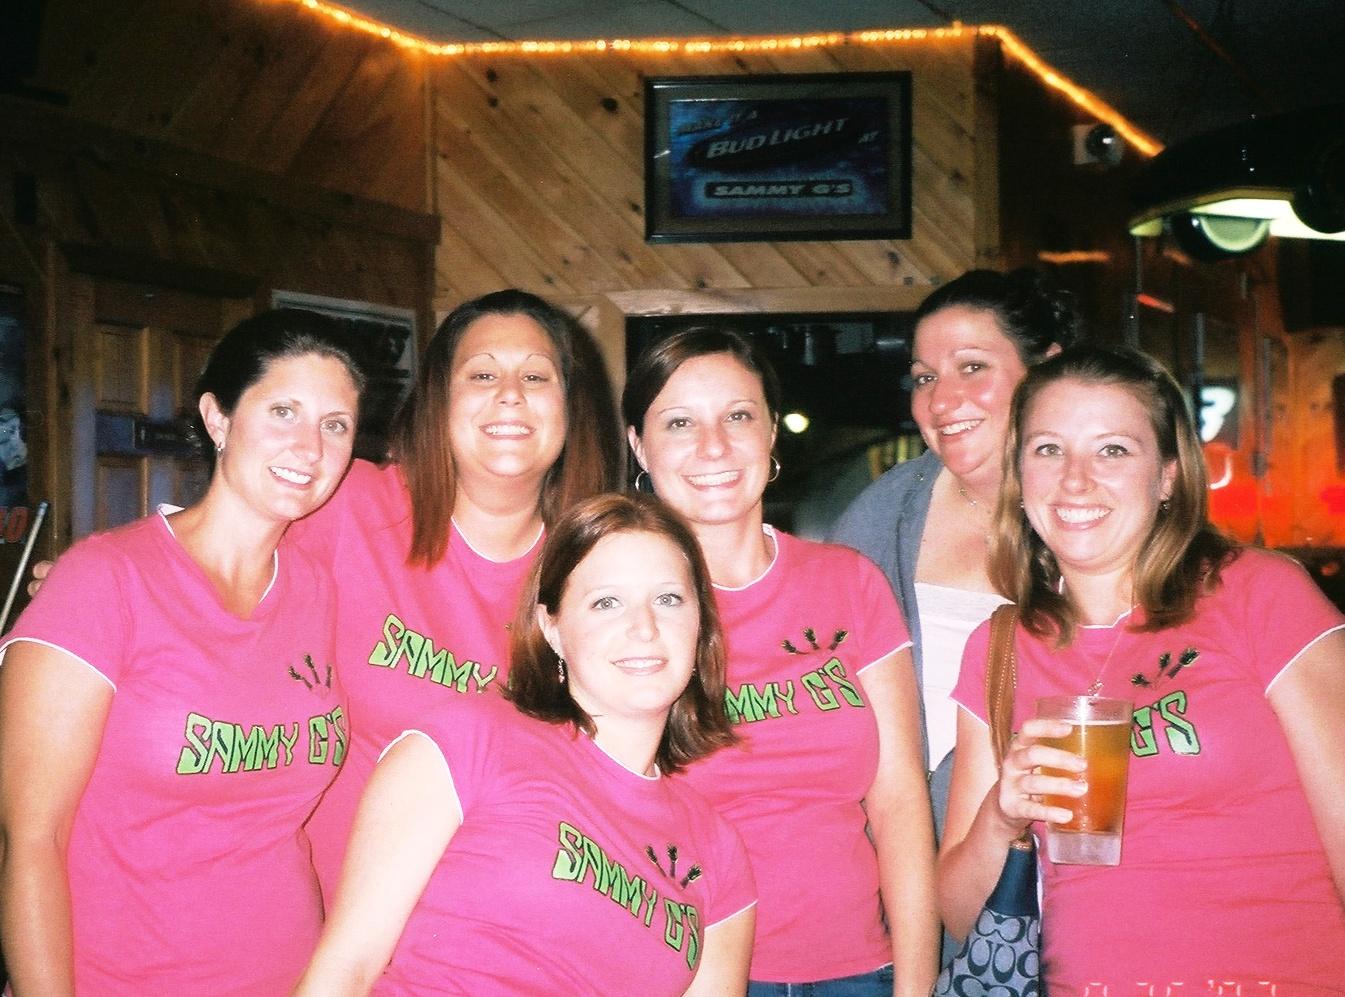 Design your own t-shirt female - Sammy G Girls Darts Rny T Shirt Photo